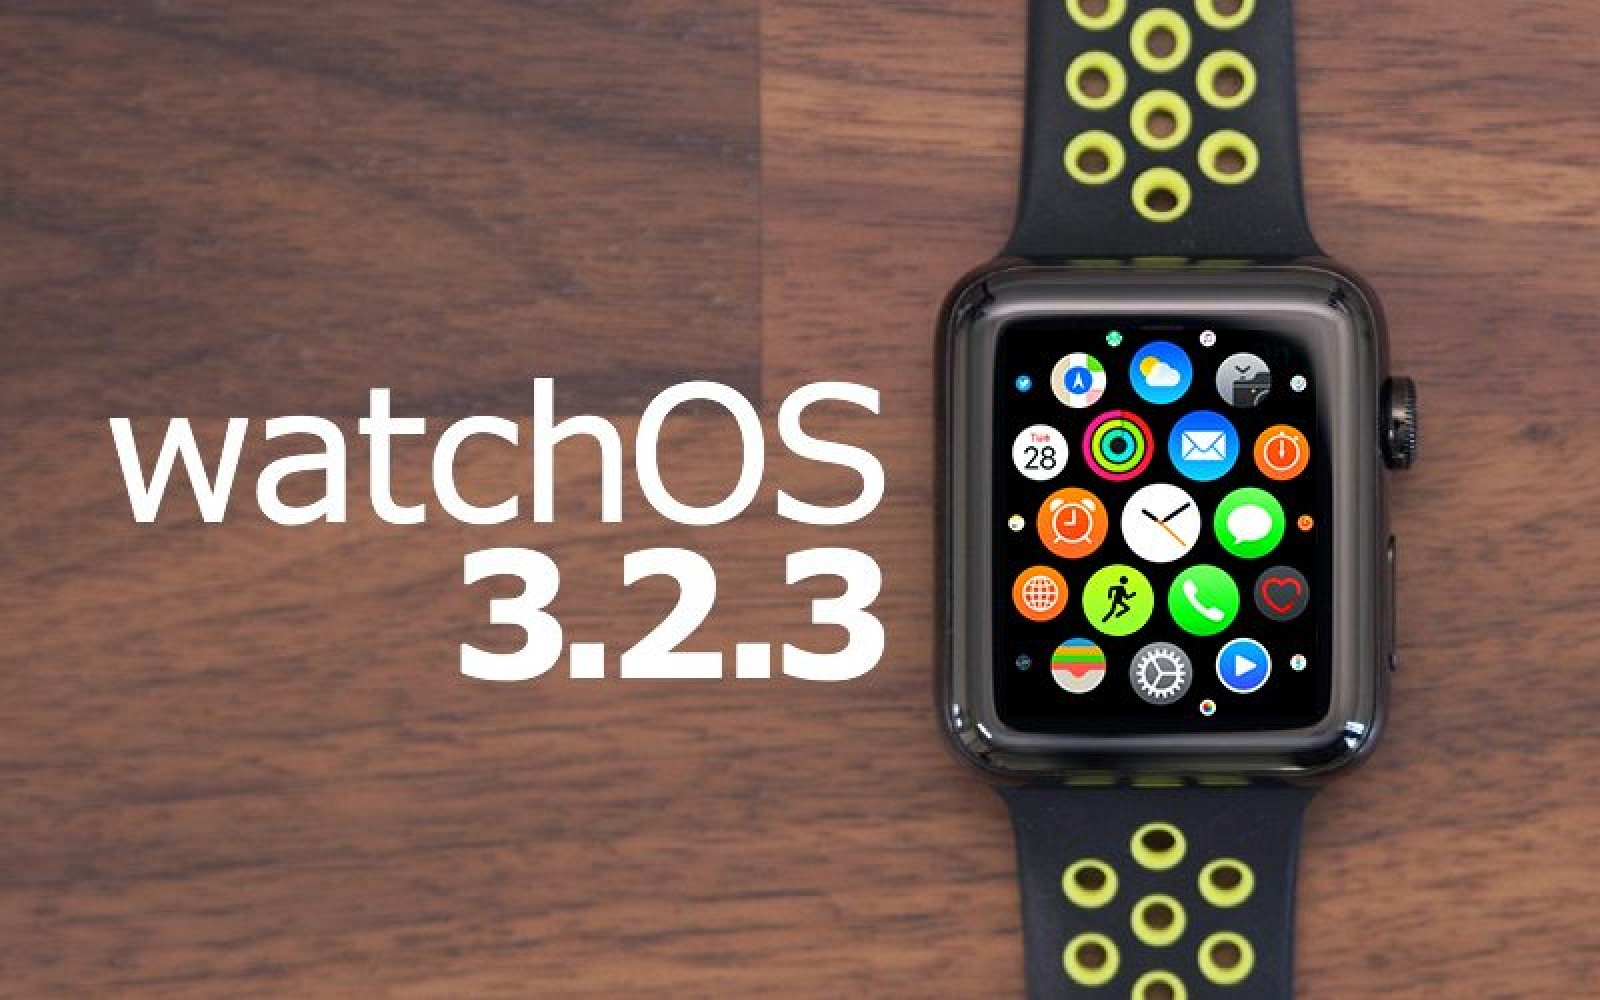 Watchos 3 major update now available - Watchos 3 Major Update Now Available 30